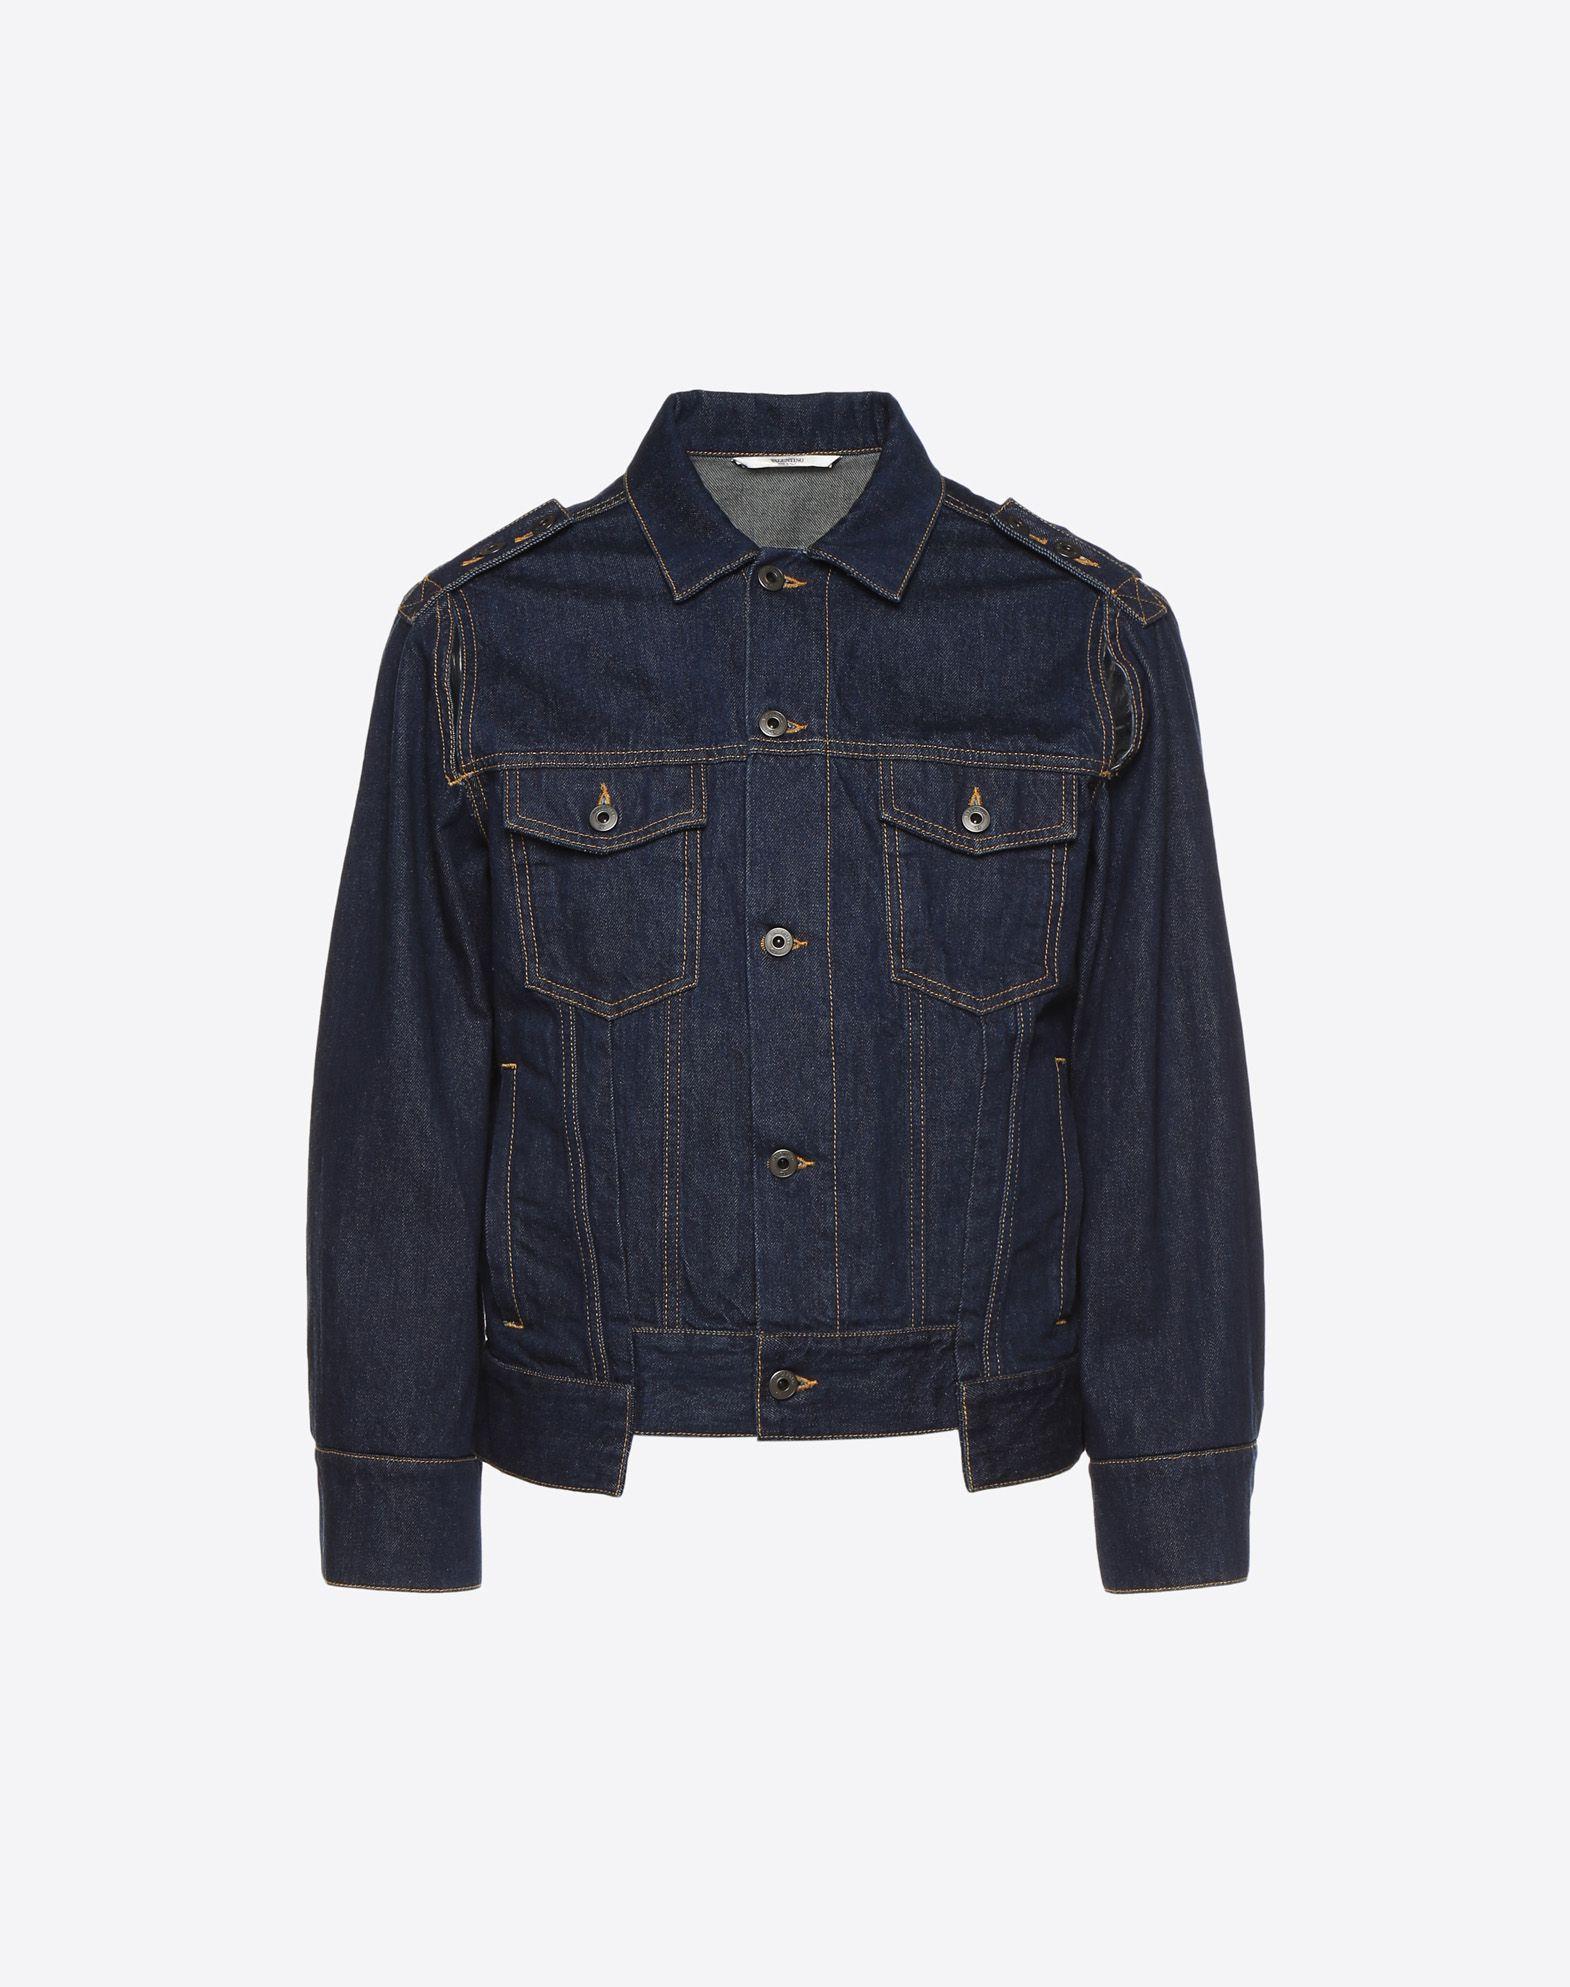 VALENTINO UOMO Denim jacket JACKET U f